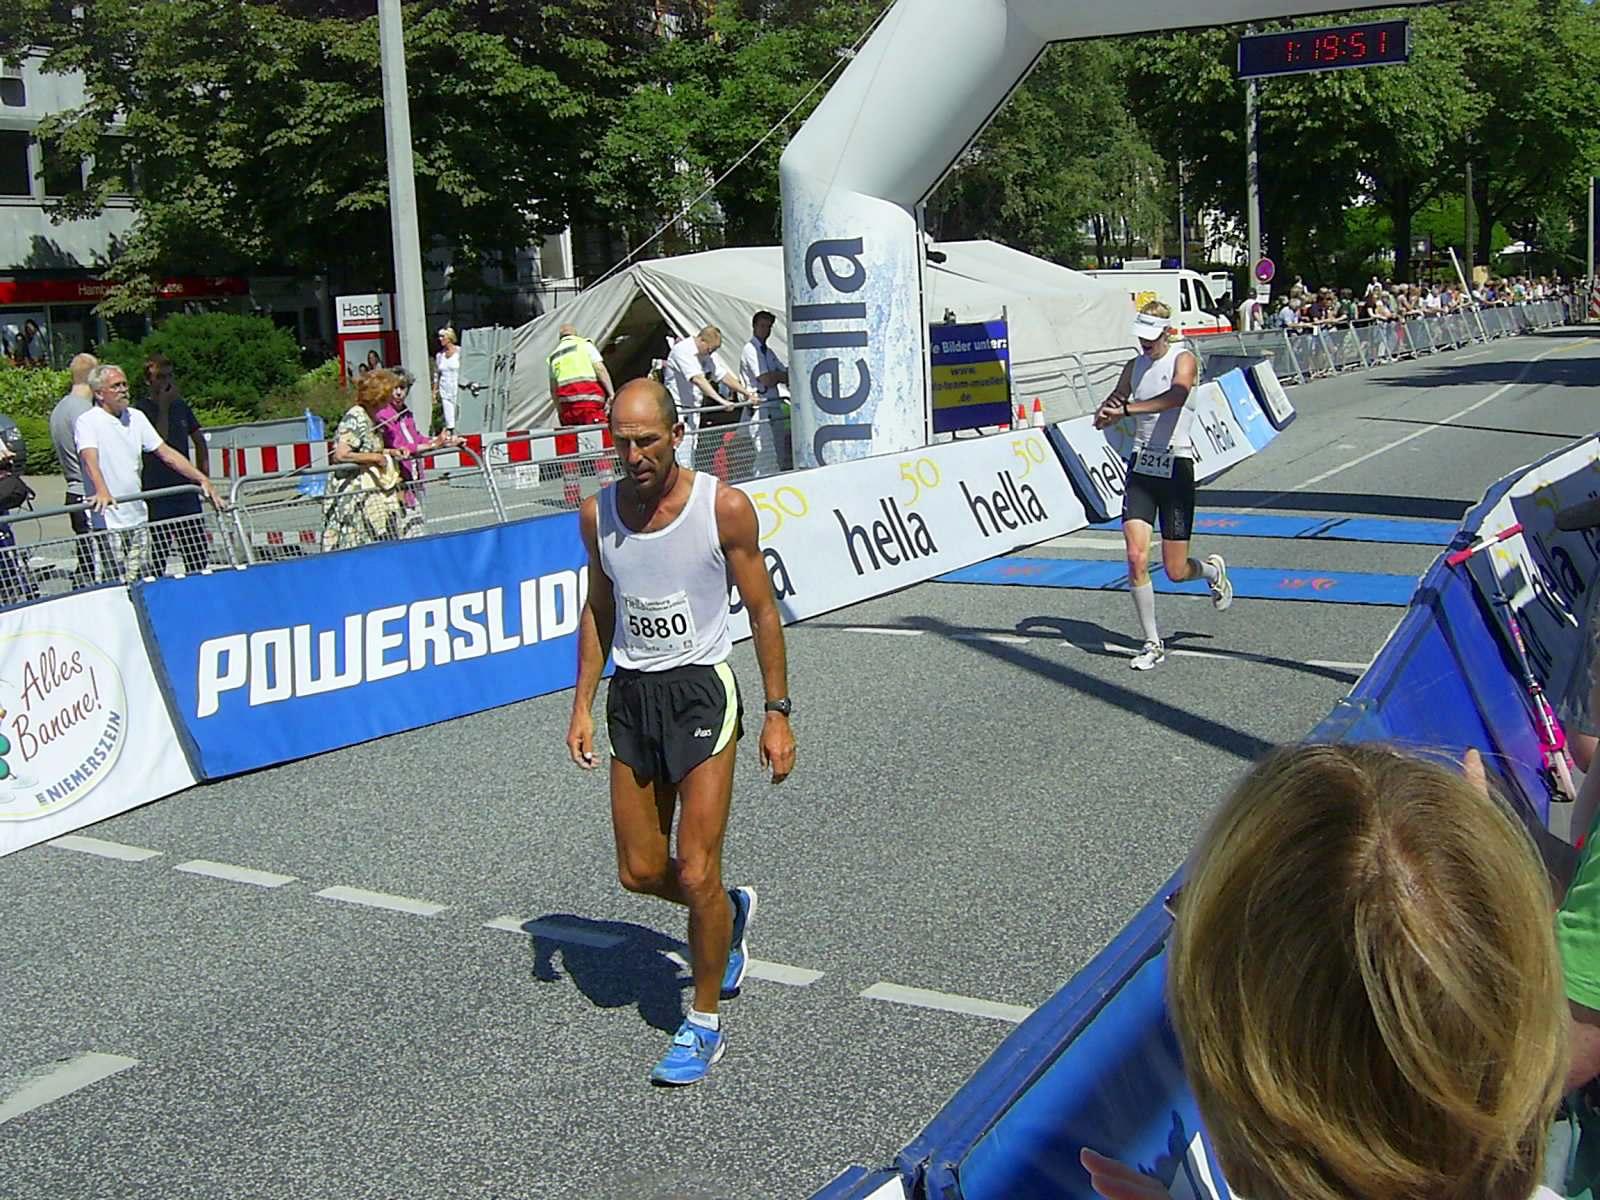 16. hella Halbmarathon 2010: Zieleinlauf Ralf Härle, 21., Hauke Claas Heller, 22.